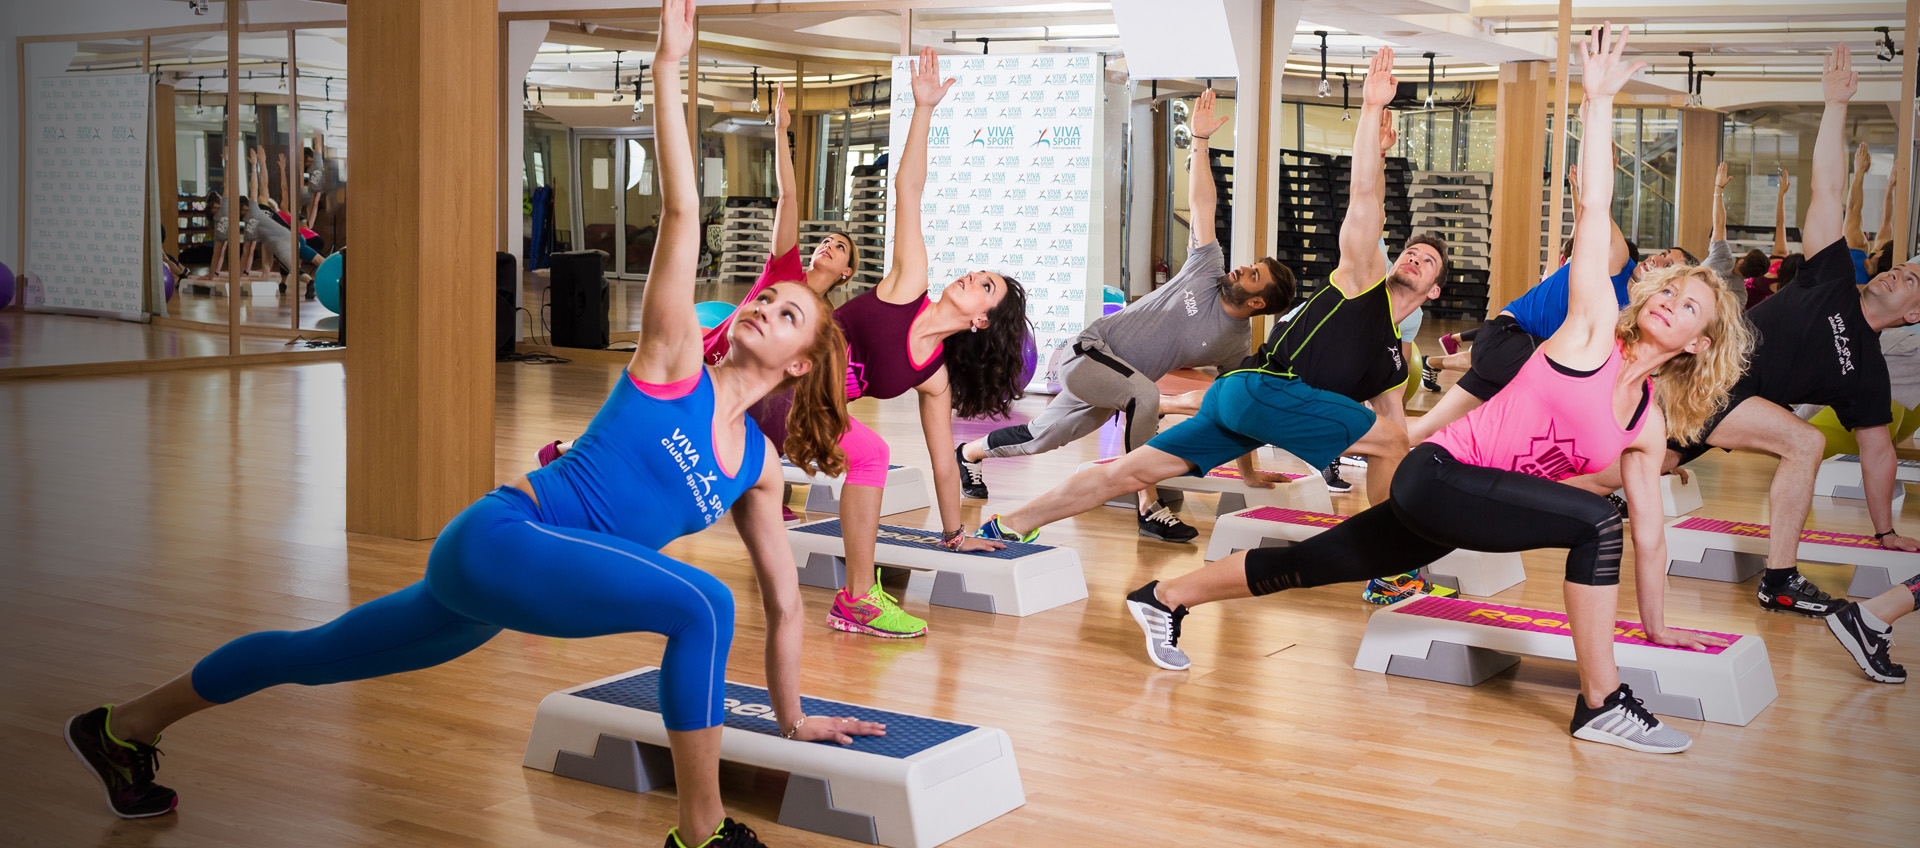 viva sport club piscina fitness aerobic activitati copii. Black Bedroom Furniture Sets. Home Design Ideas